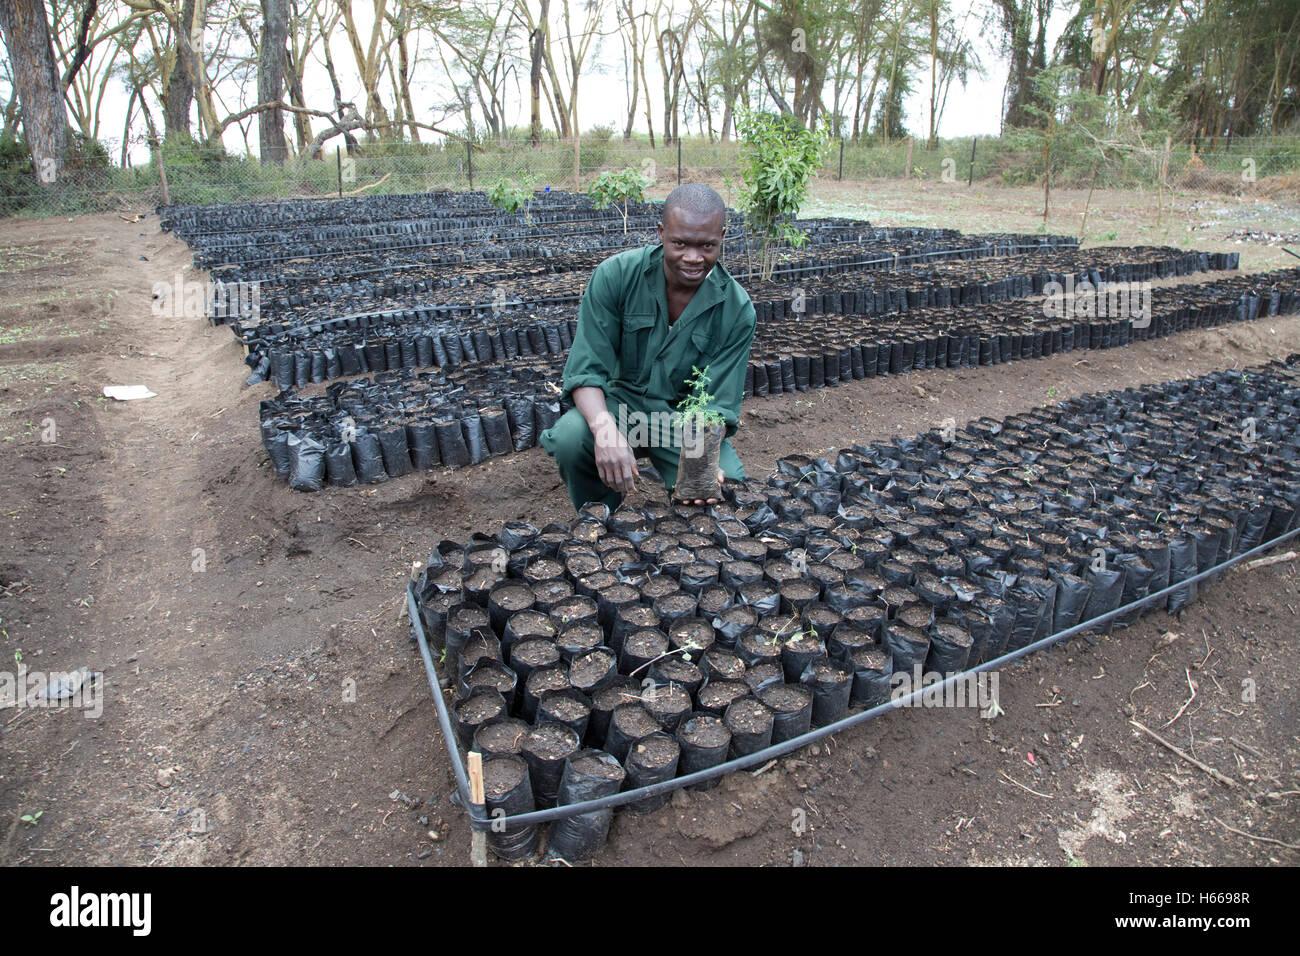 African gardener with young tree seedling in tree nursery CES Elsamere Lake Naivasha Kenya - Stock Image